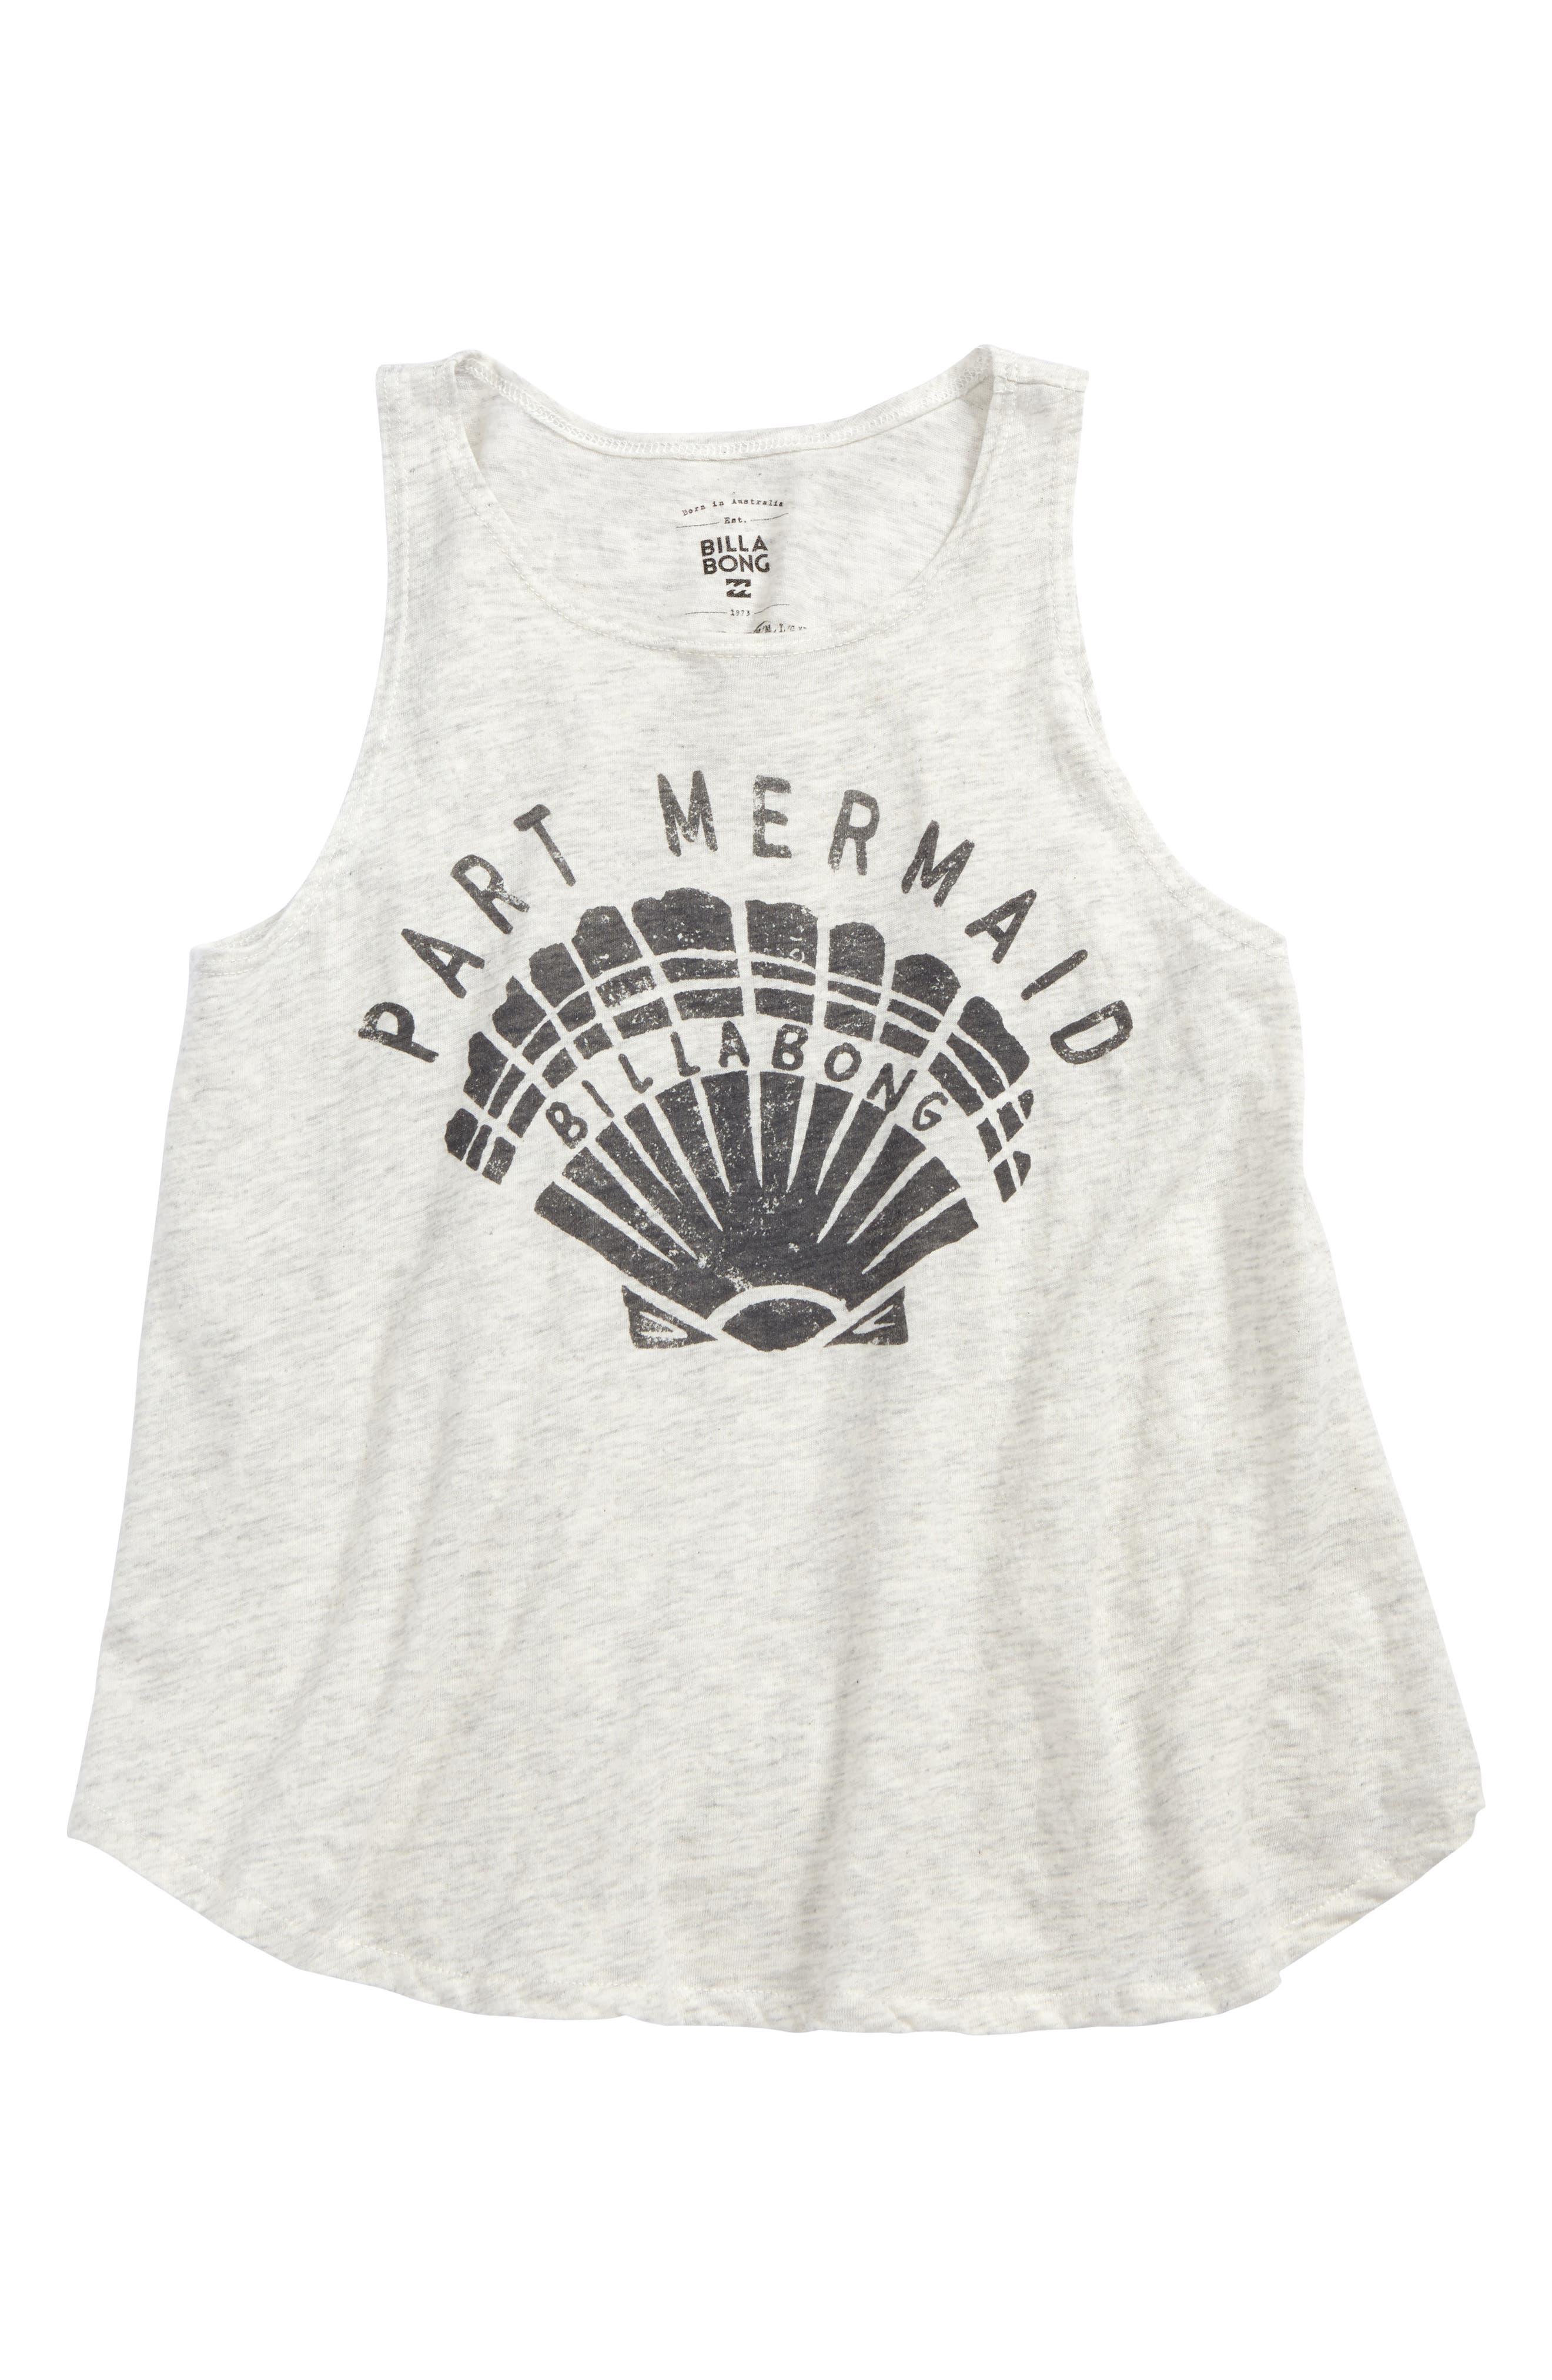 Part Mermaid Graphic Tee,                         Main,                         color, 900